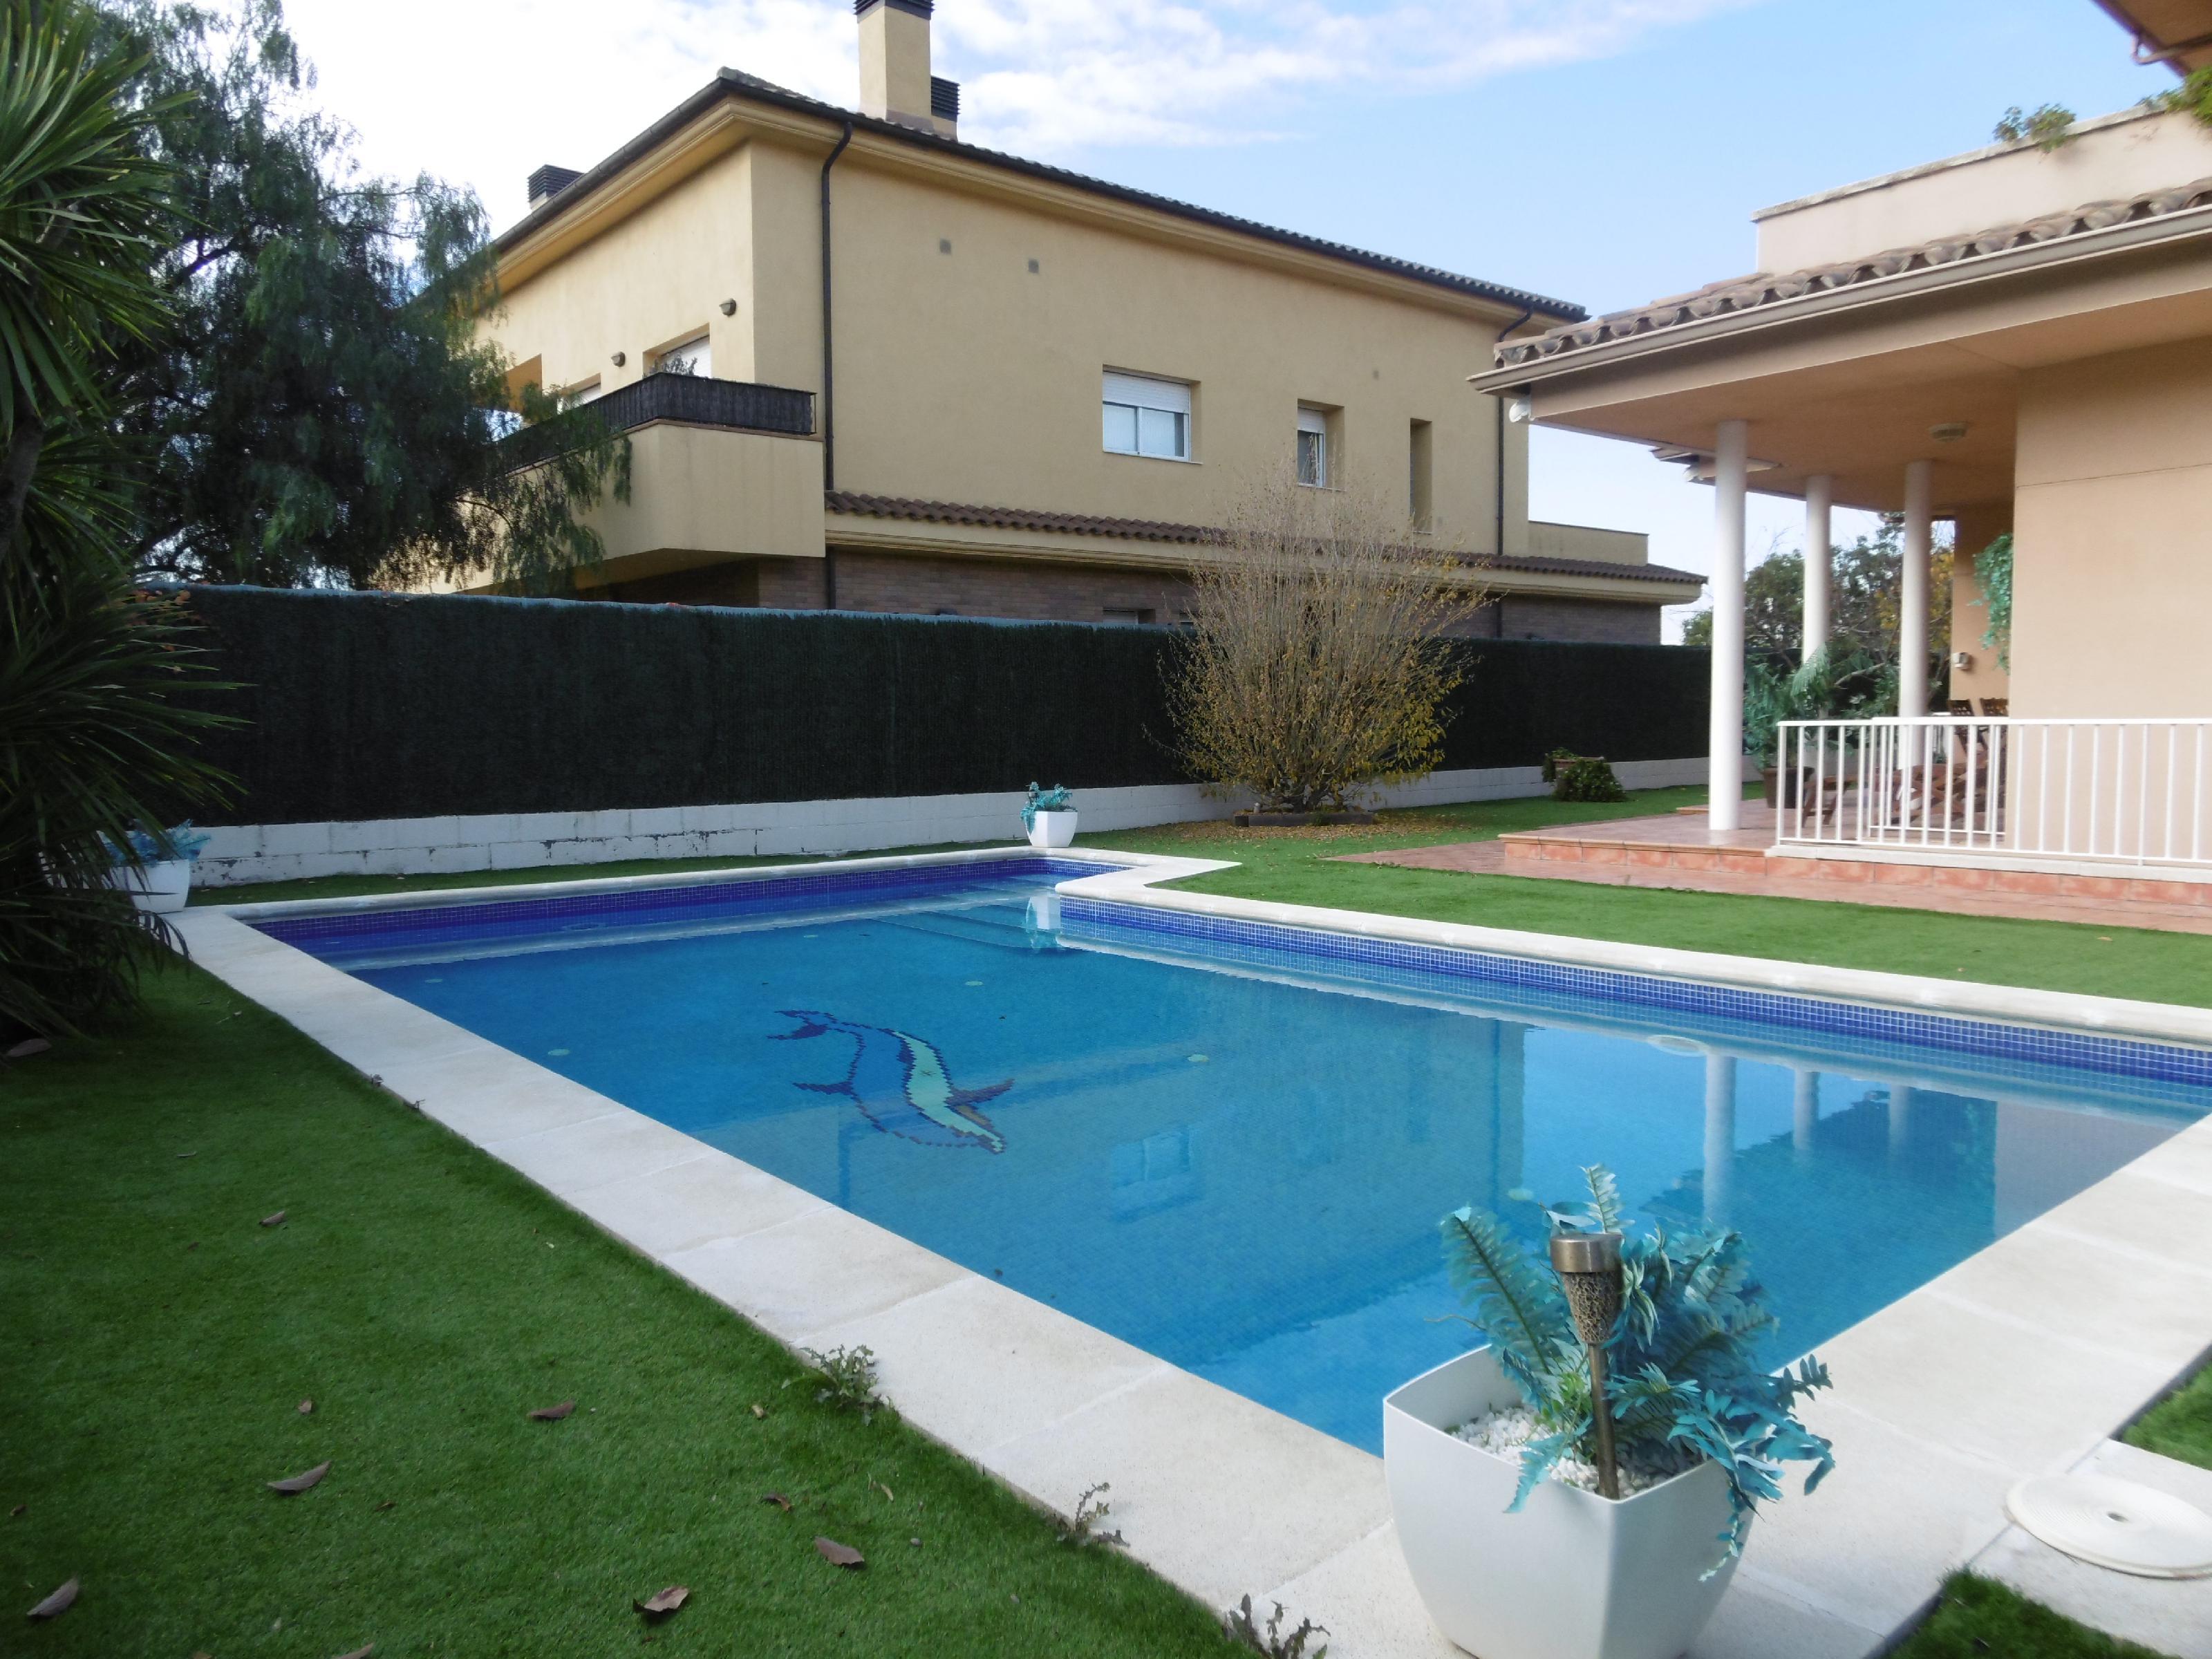 Imagen 2 Casa Aislada en venta en Molins De Rei / Riera Nova Molins